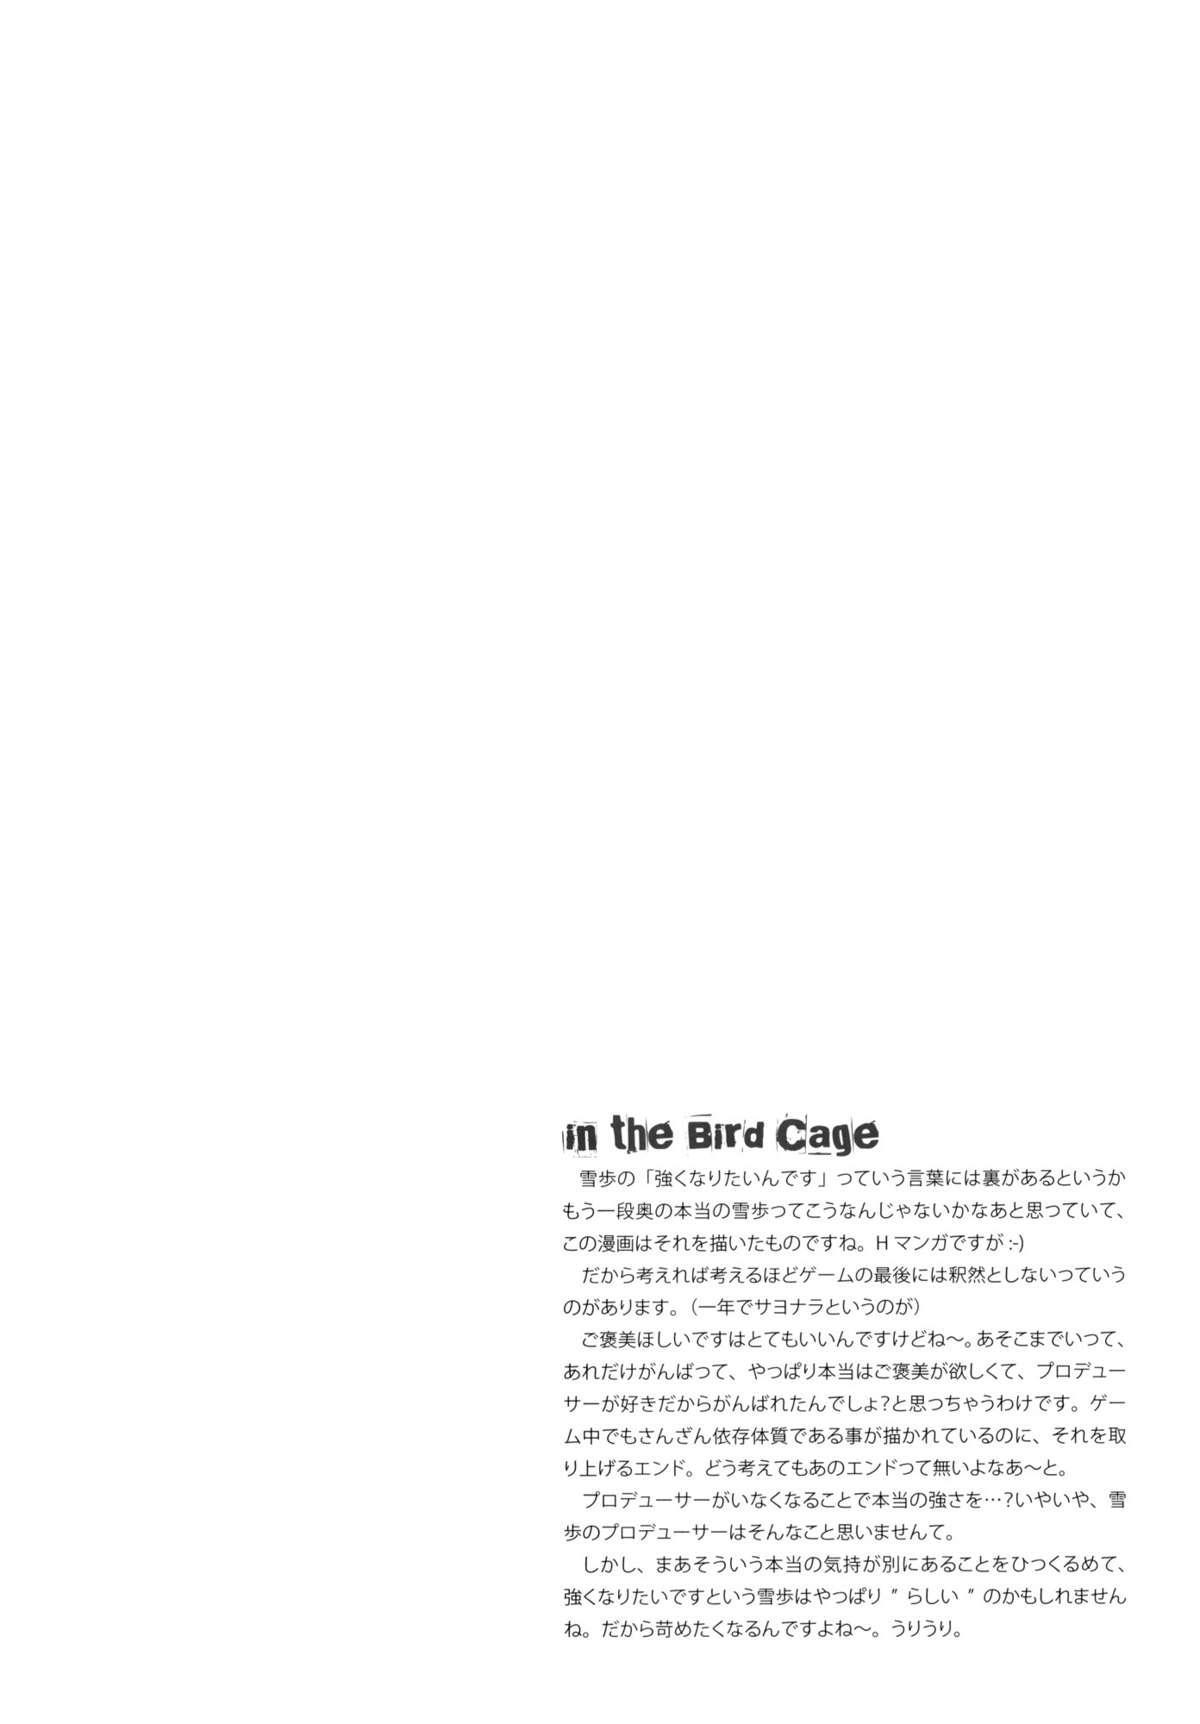 IDOLTIME SPECIAL BOOK YUKIHO HAGIWARA in the Bird Cage 26